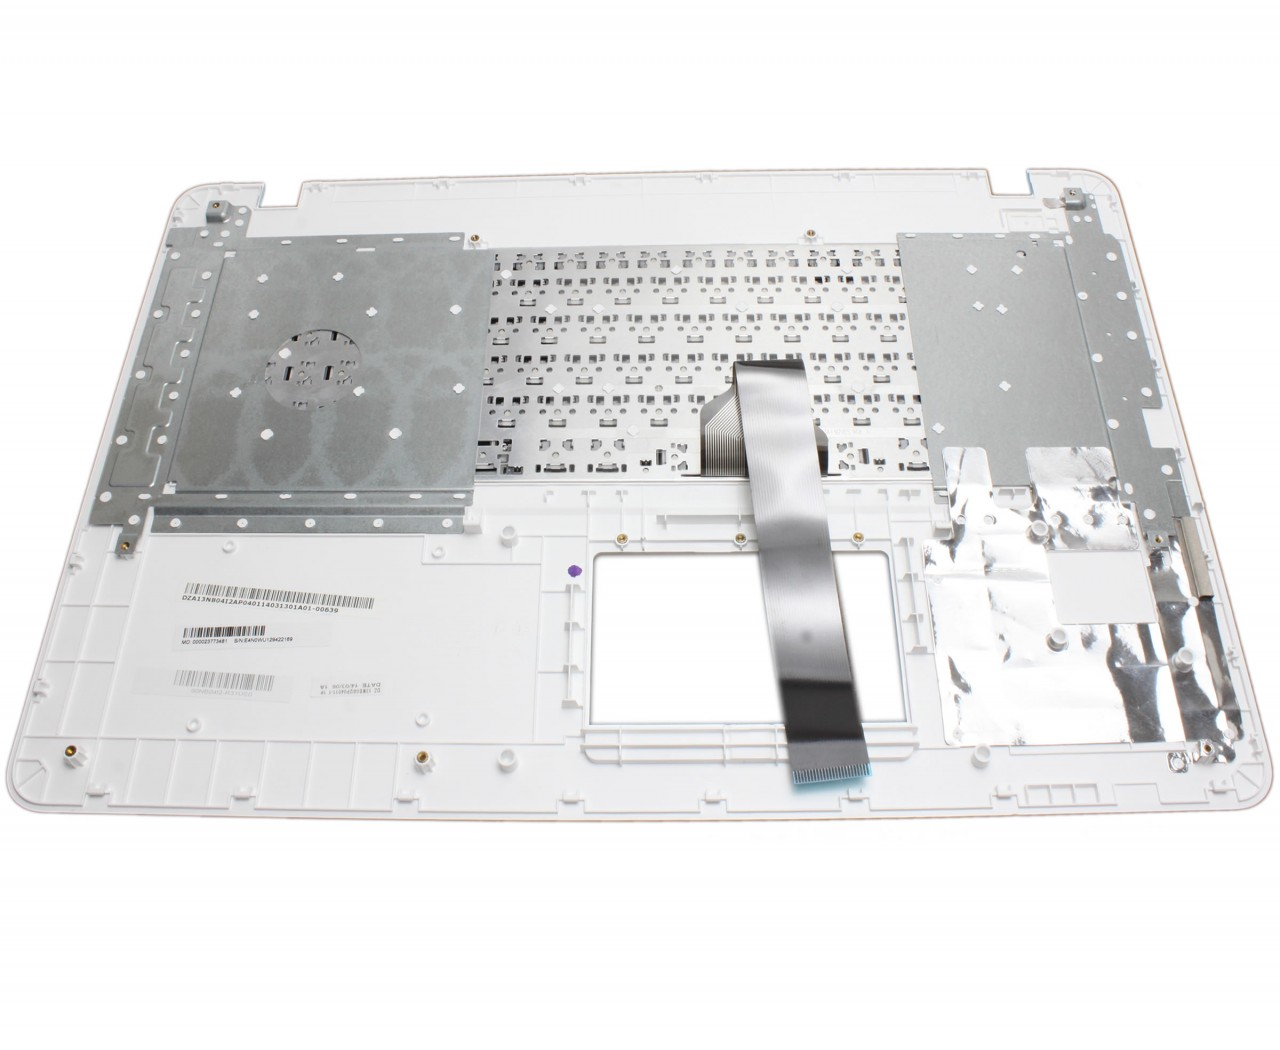 Tastatura Asus 90NB08E1-E31US0 neagra cu Palmrest alb imagine